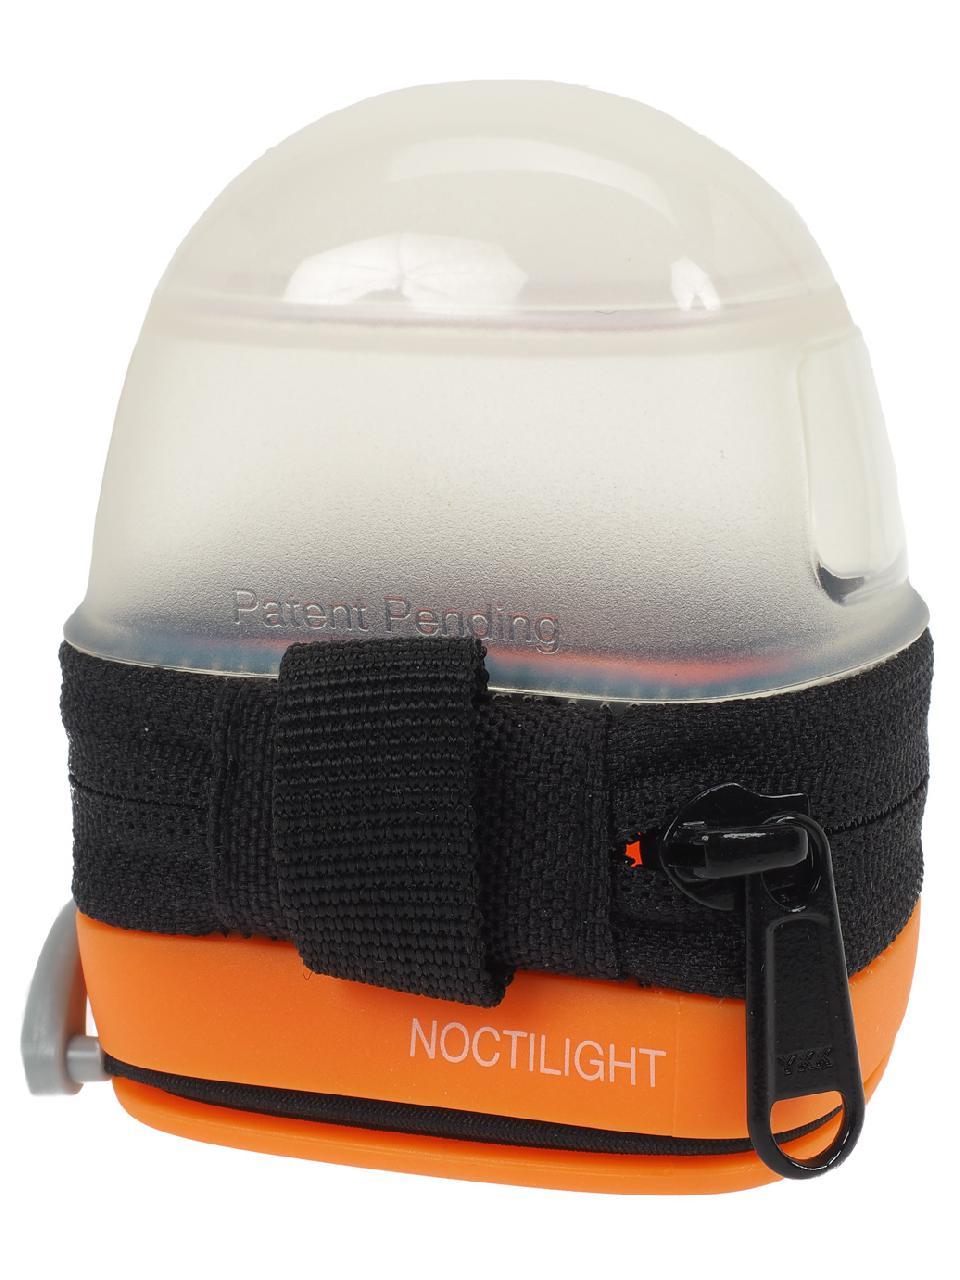 Lampe-frontale-Petzl-charlet-Noctilight-boitier-Noir-14966-Neuf miniature 4